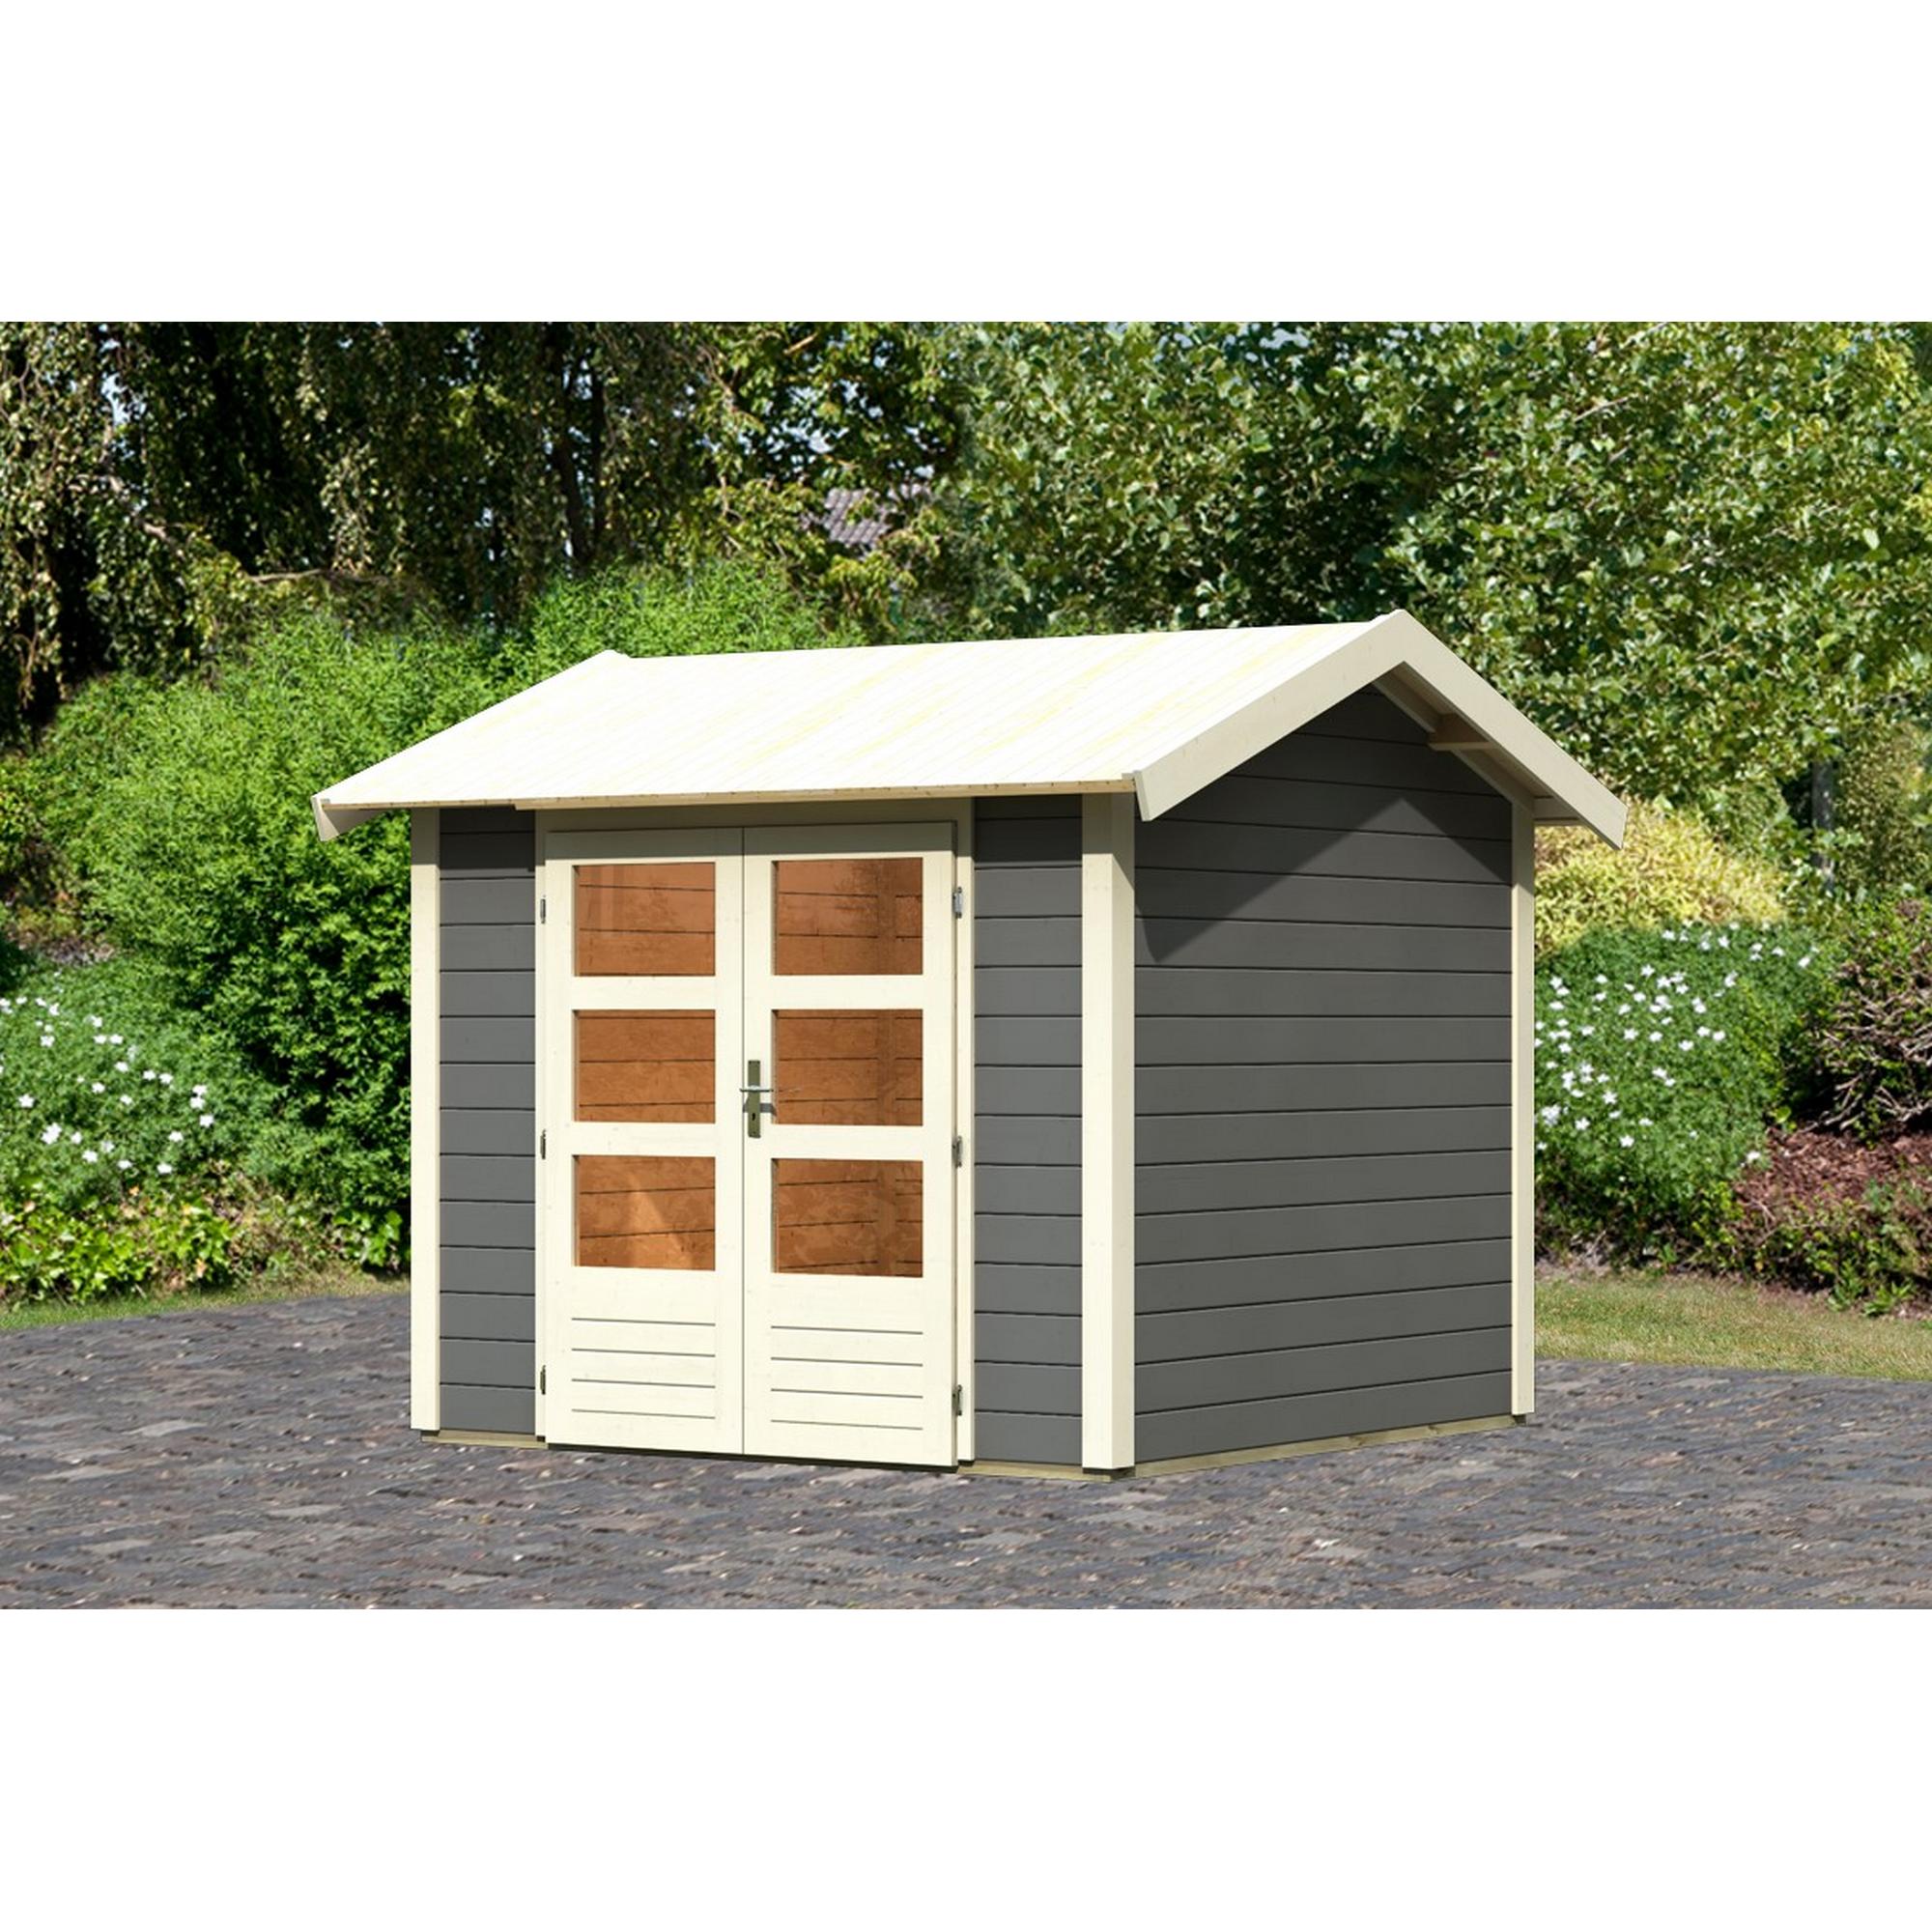 *Karibu Gartenhaus 'Mylau 3' 501 x 217 x 211 cm terragrau*